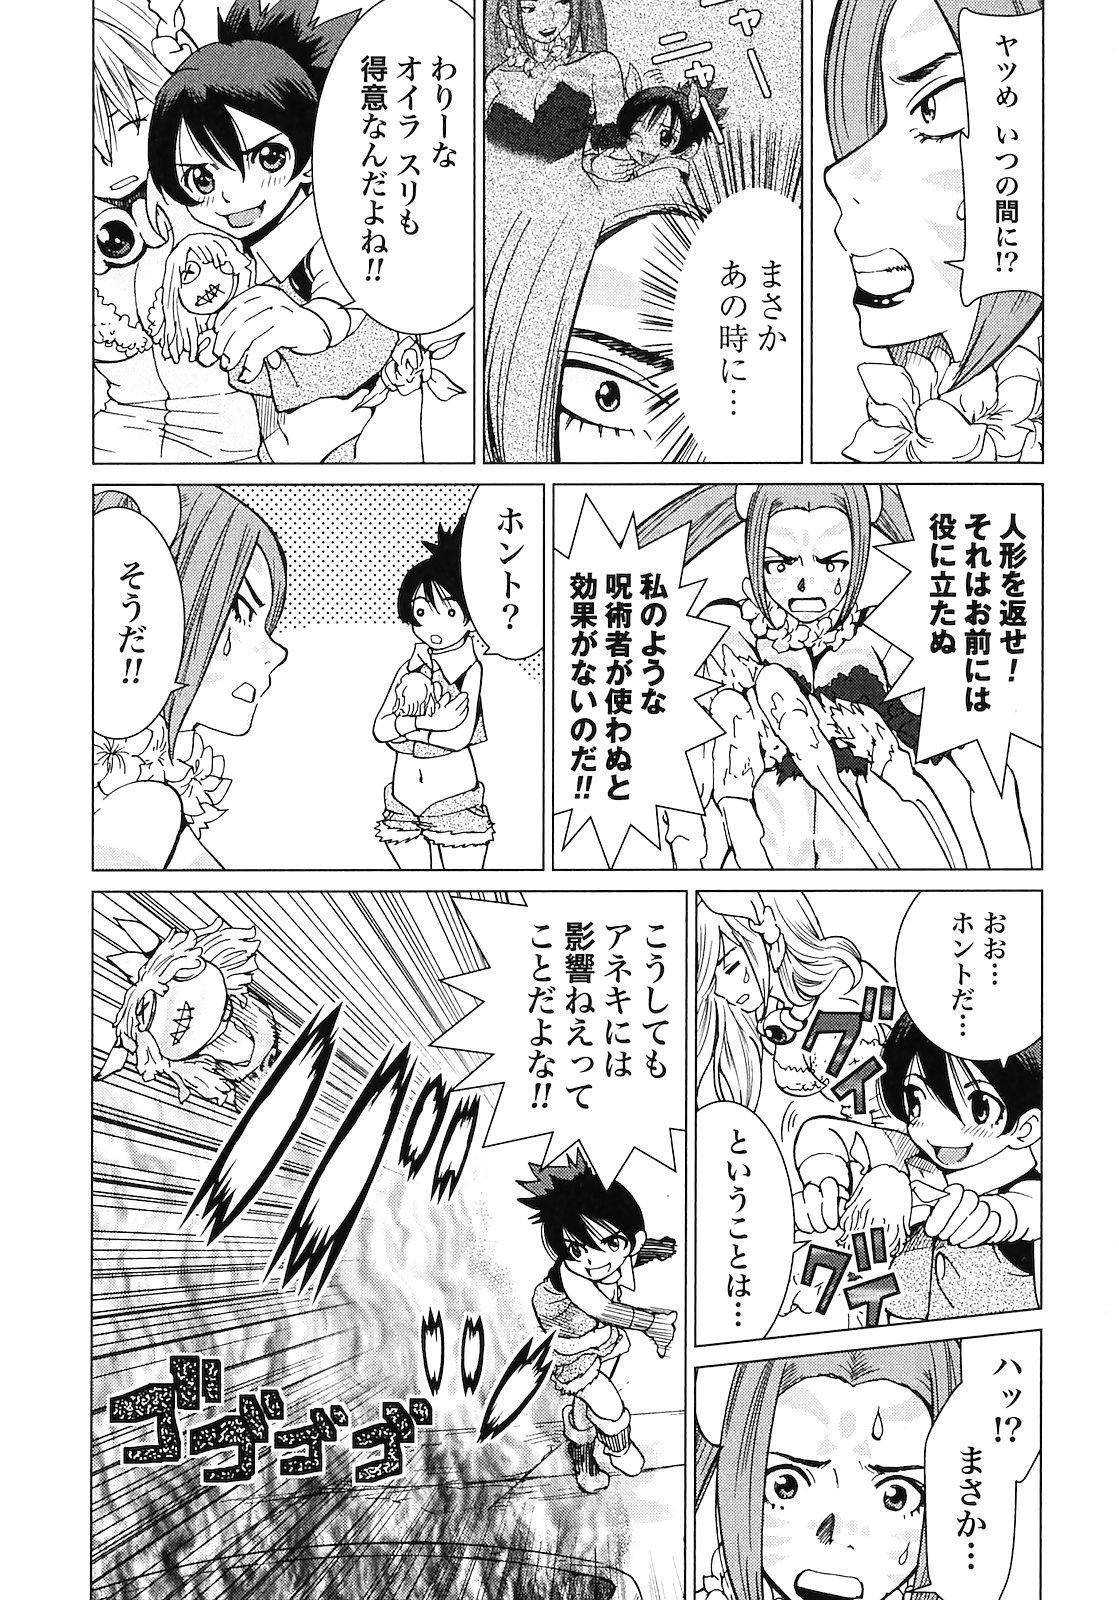 Makyo no Shanana Vol.02 160